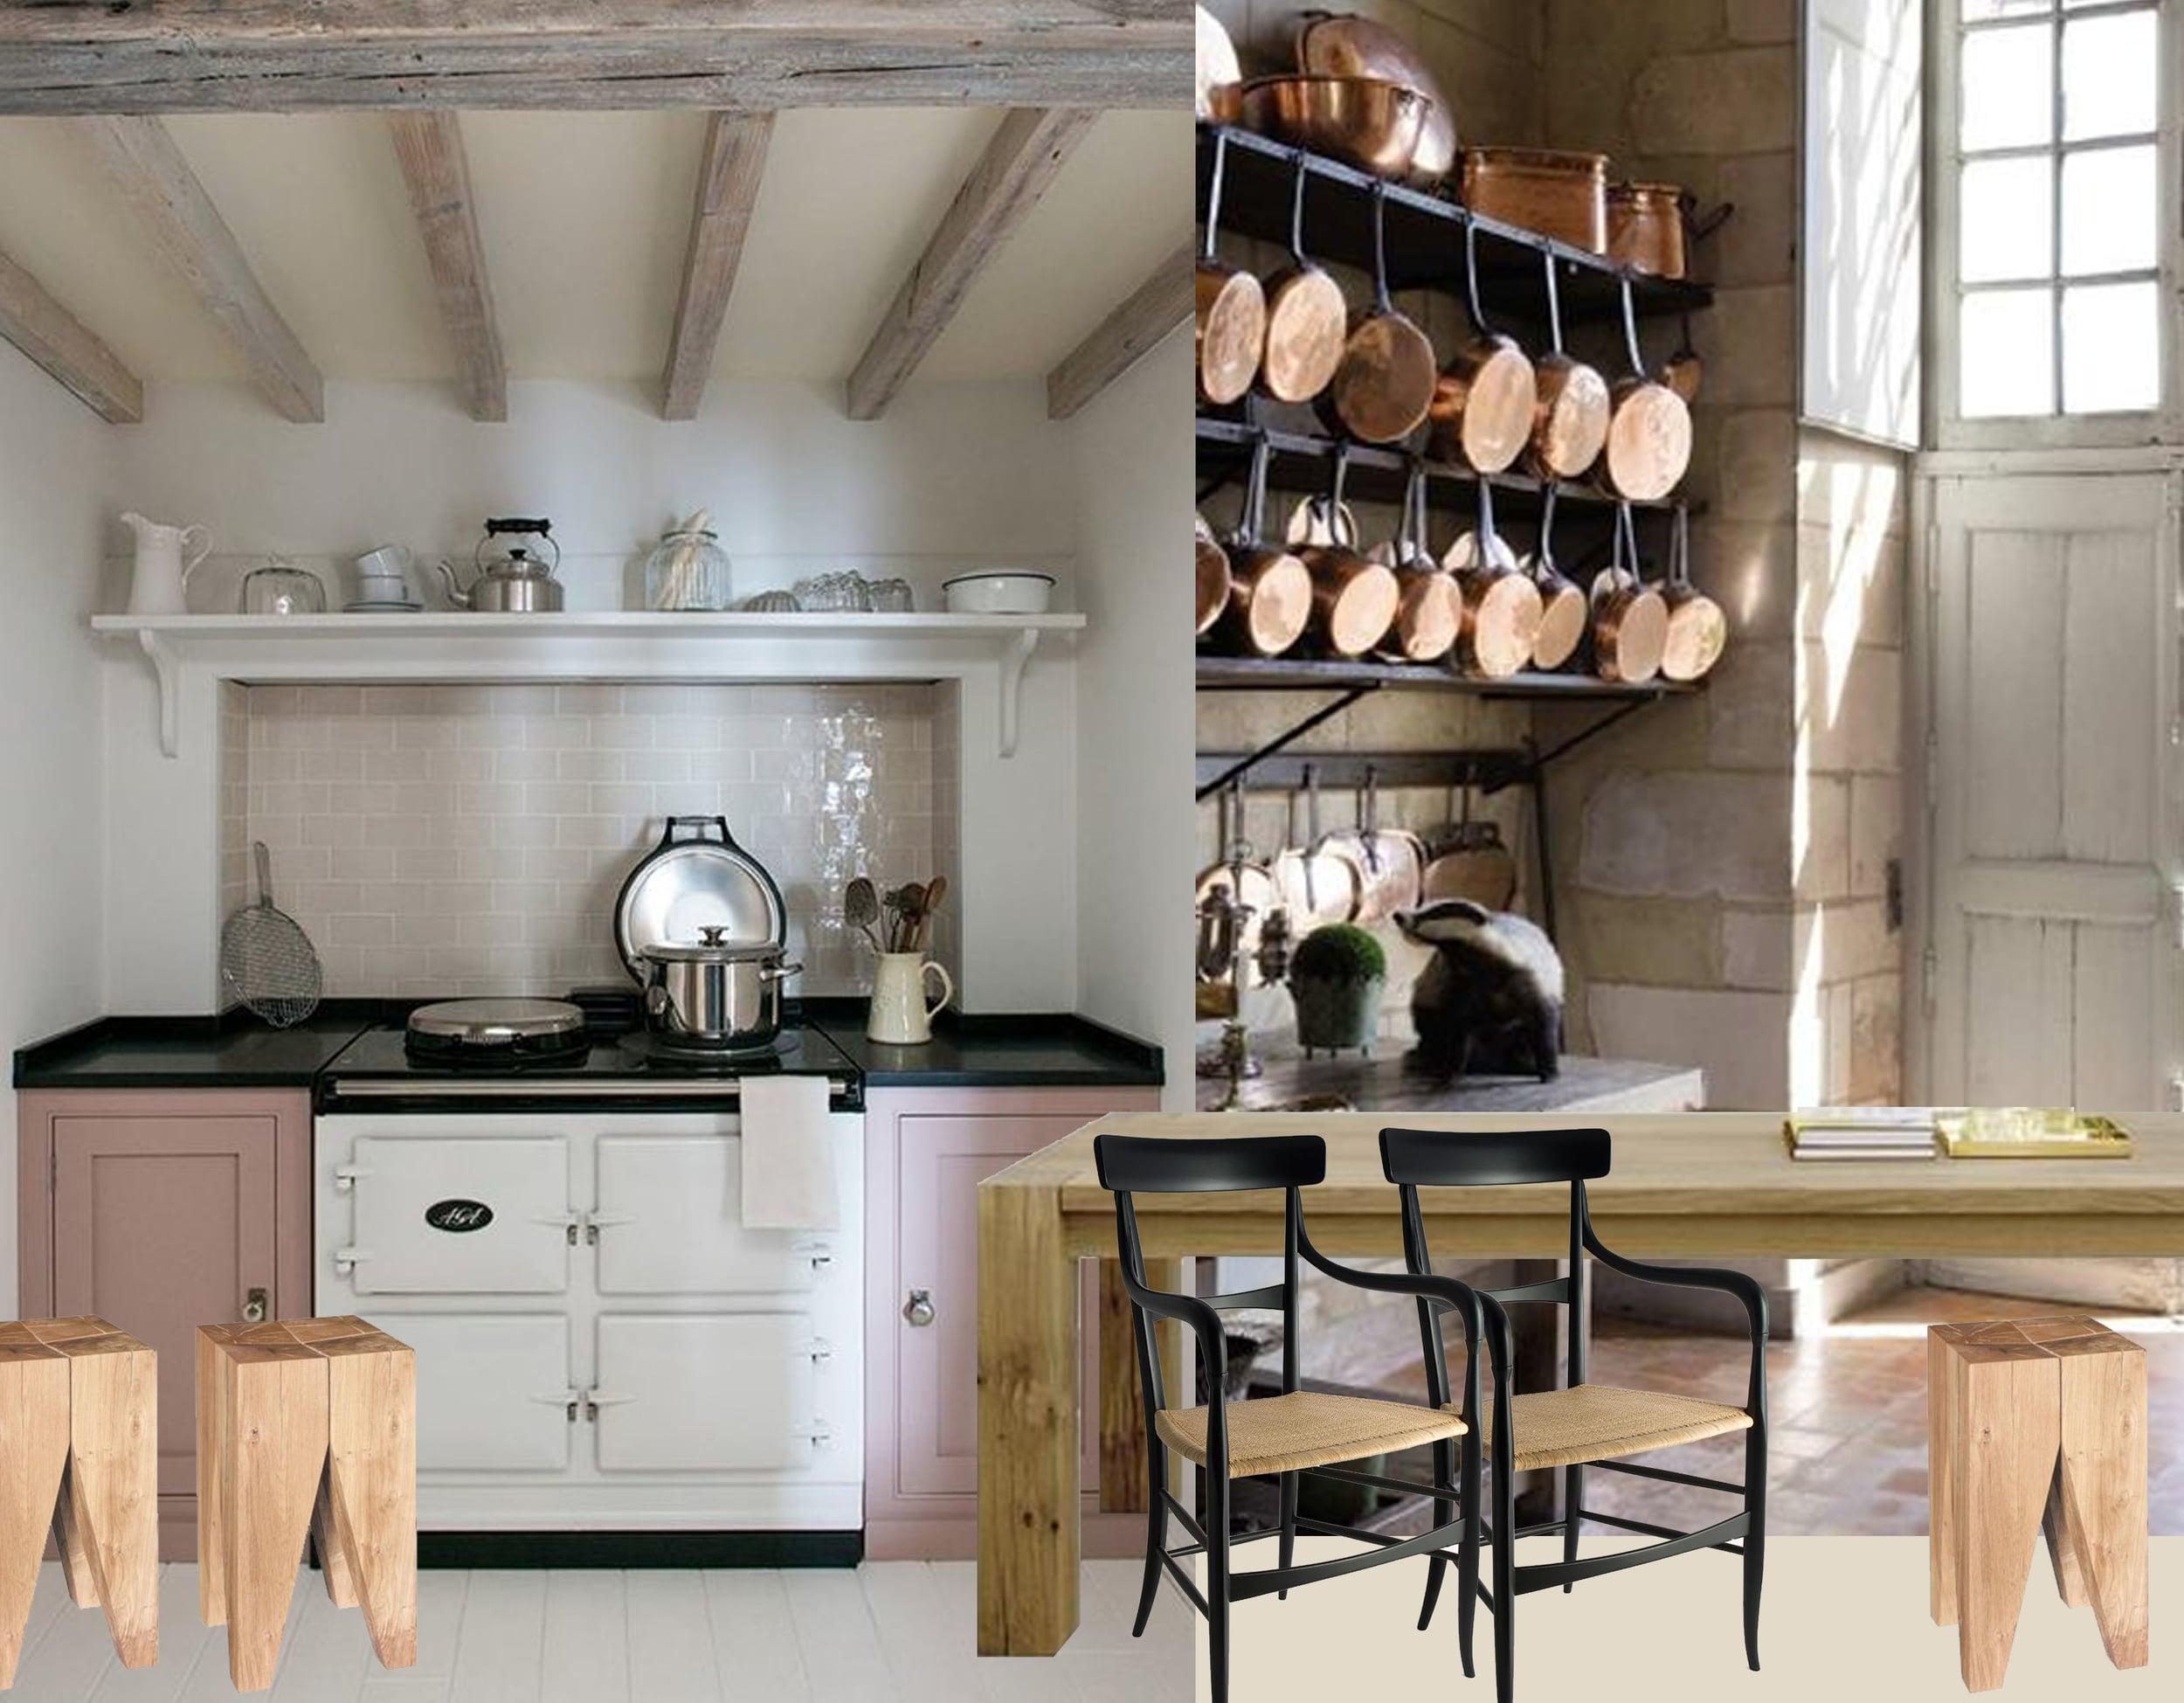 Aga stove image via  Middleton  - Backenzahn stool  E15  - table Bigfoot  E15 - Poltrona 900  Segno Italiano - image copper pots via Pinterest